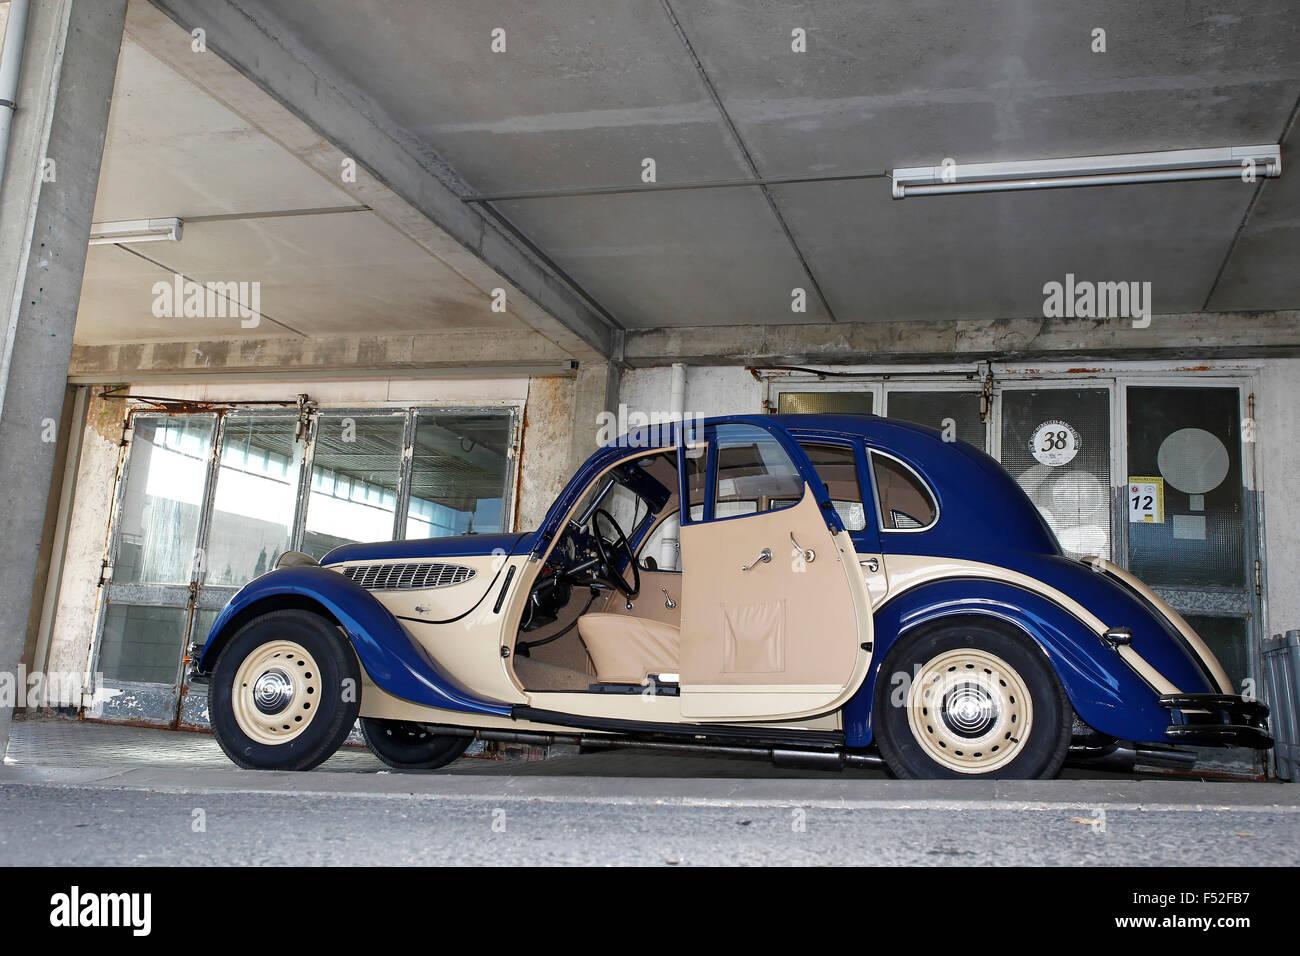 Car Bmw 326 Year Of Construction Unknown Vintage Car Blue Beige